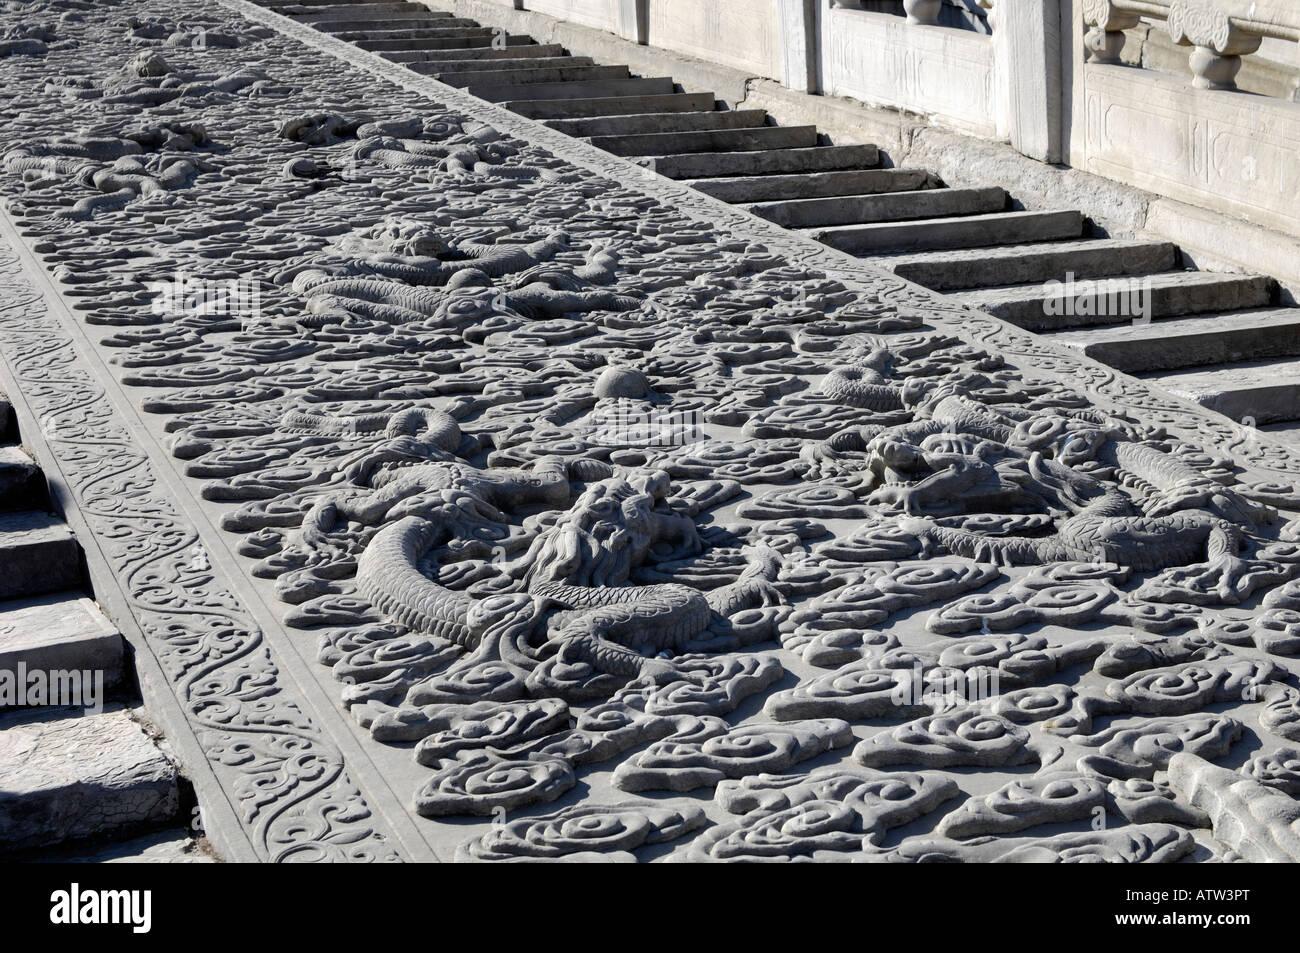 Stone carving dragon in Forbidden City Beijing 03-Mar-2008 - Stock Image